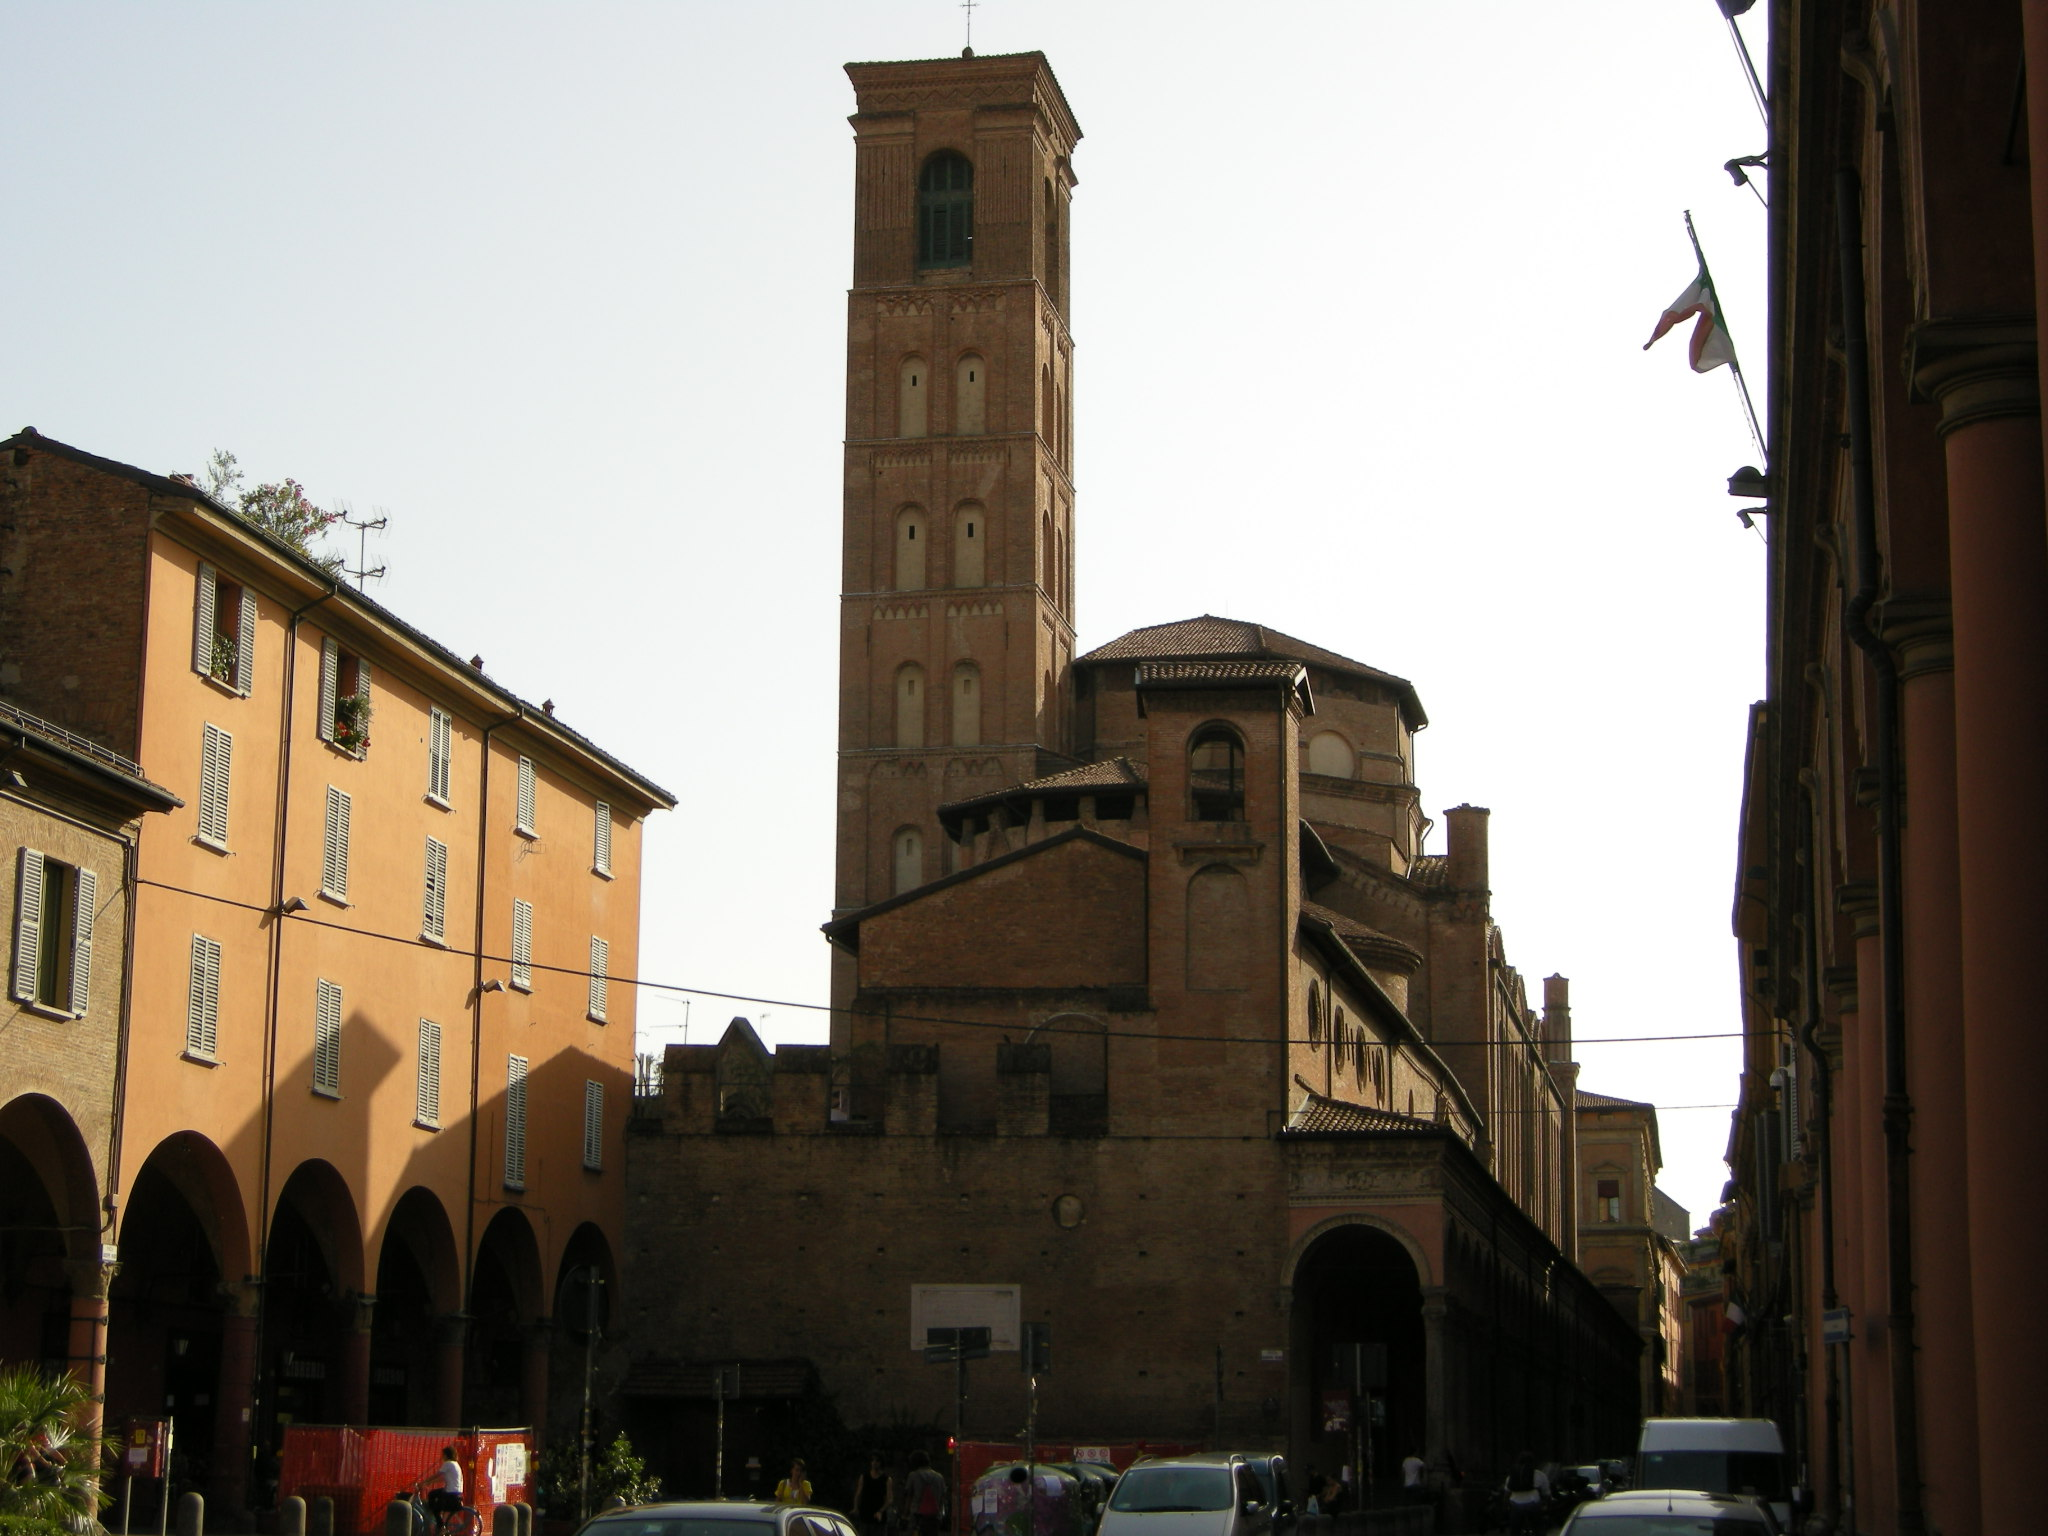 https://upload.wikimedia.org/wikipedia/commons/3/30/Bologna%2C_san_giacomo_maggiore%2C_retro.JPG